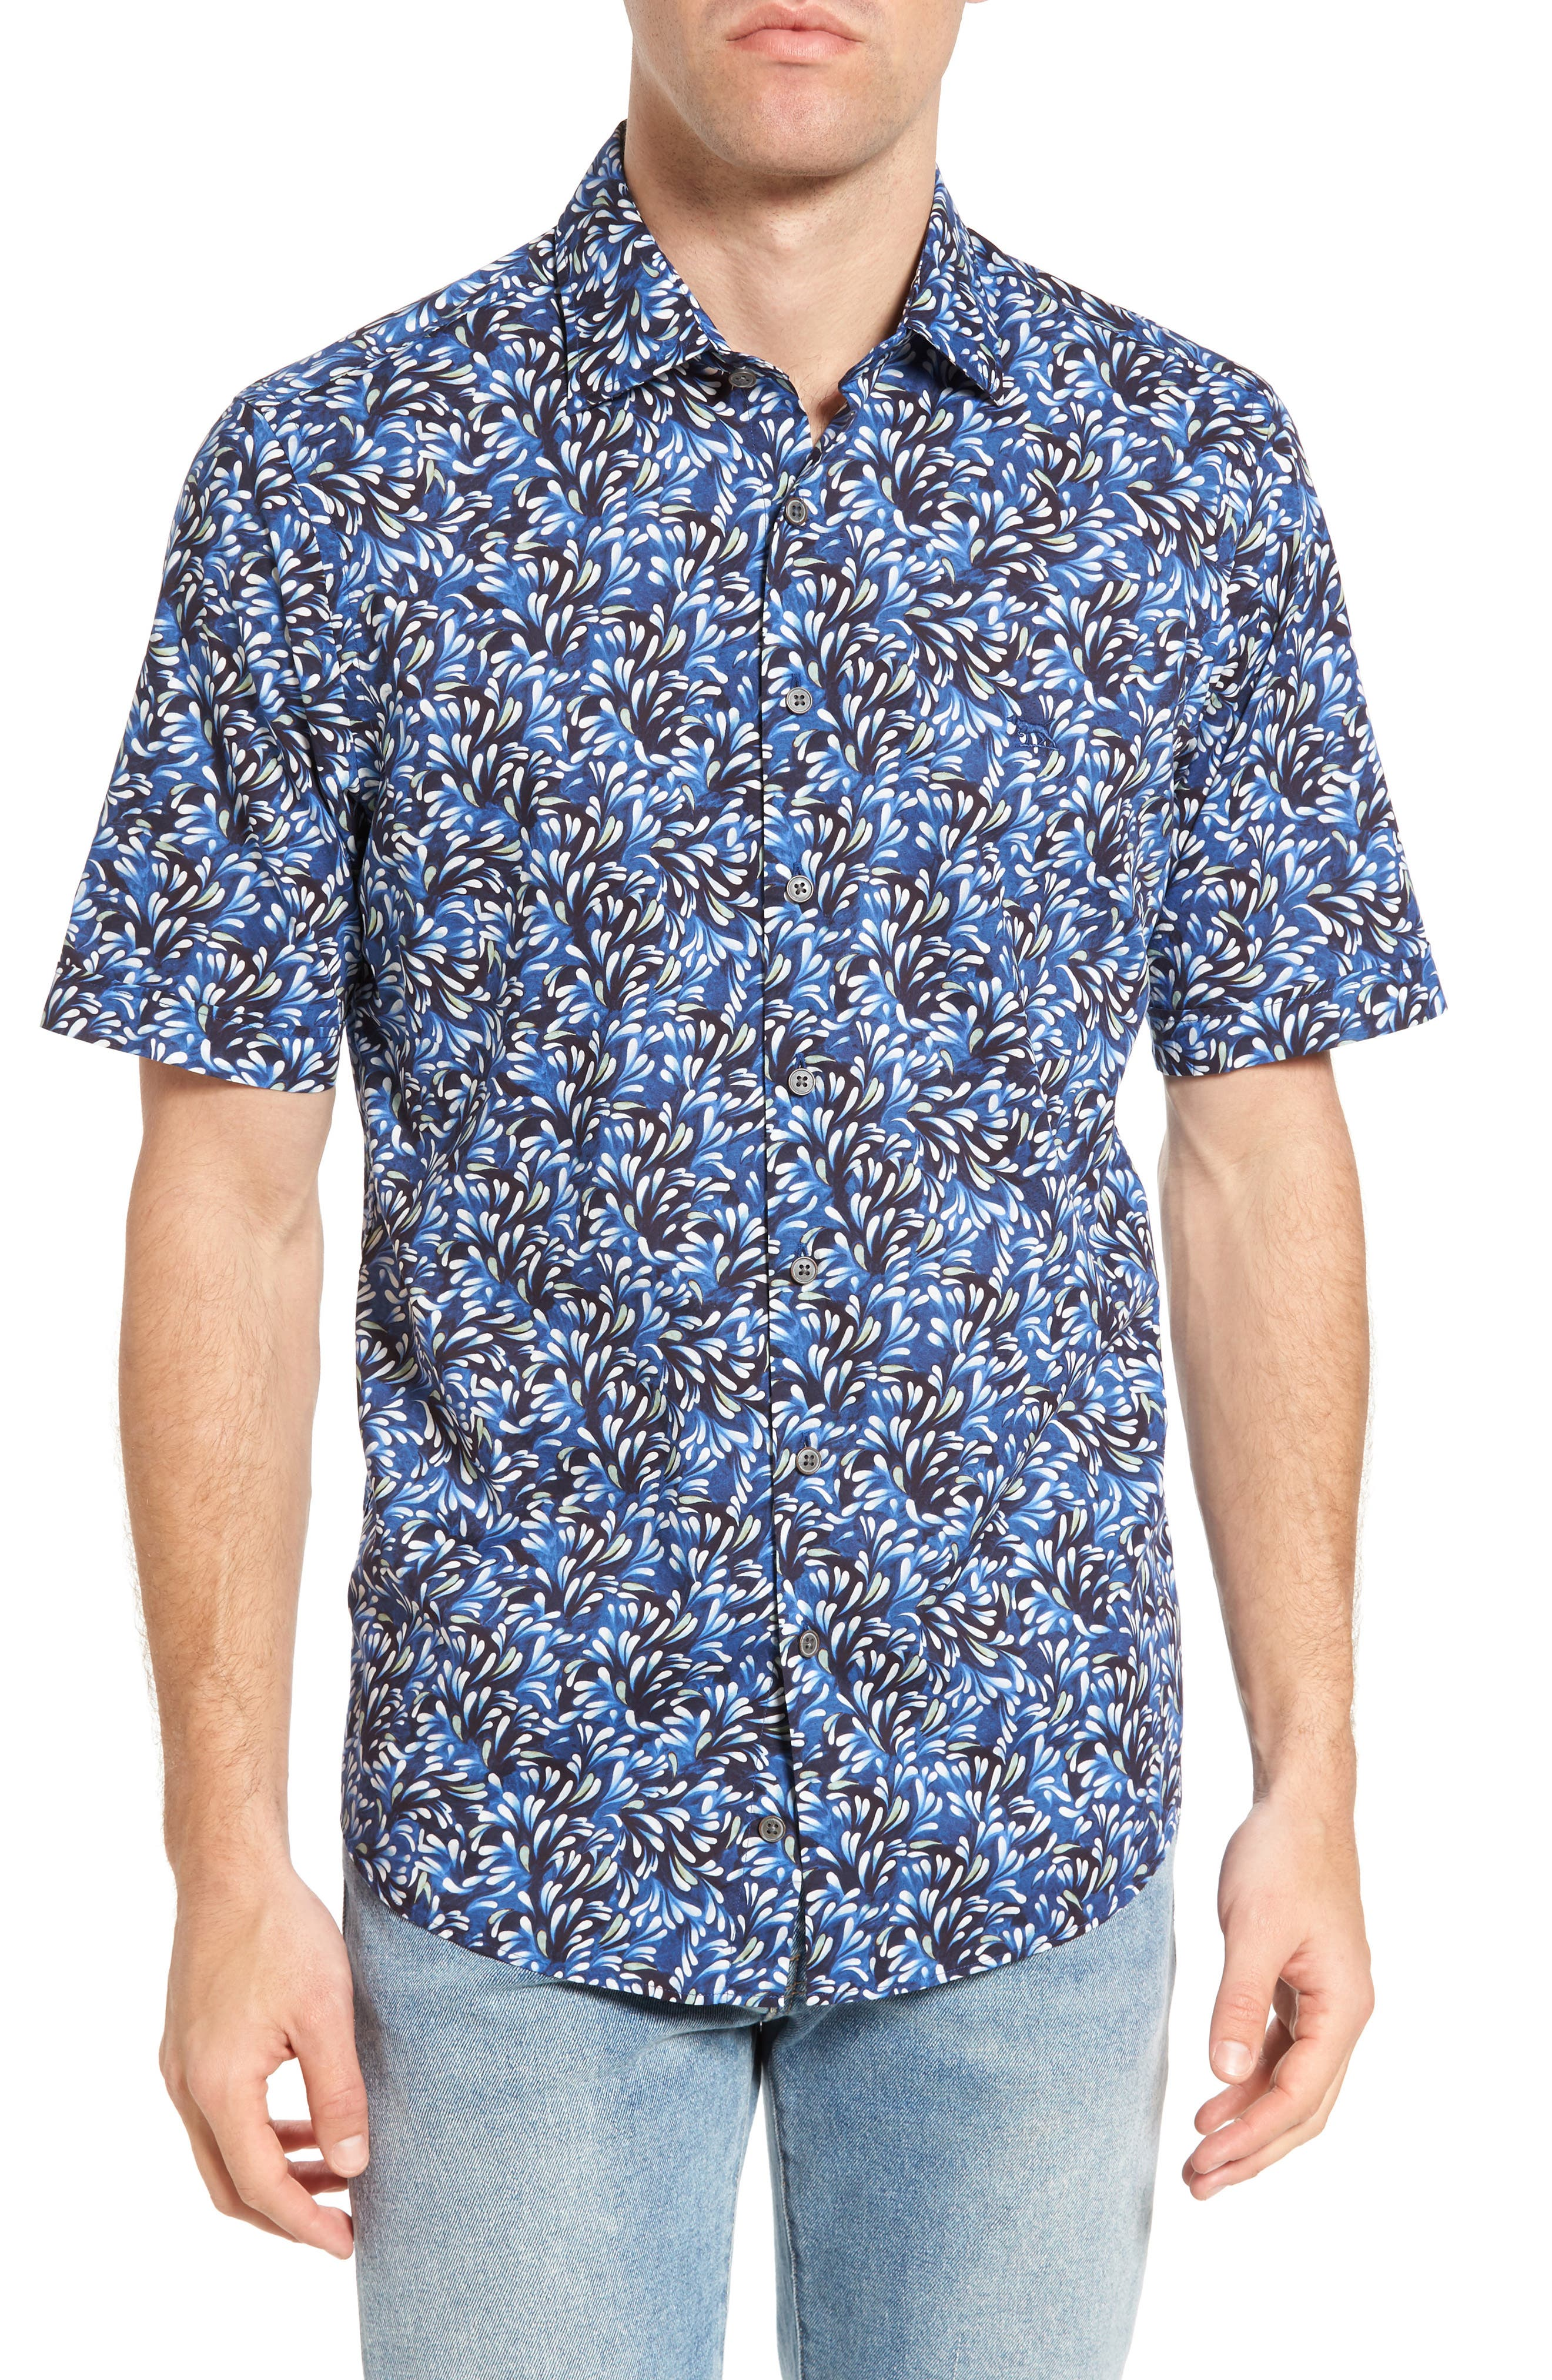 Alternate Image 1 Selected - Rodd & Gunn Sunset Road Original Fit Print Sport Shirt